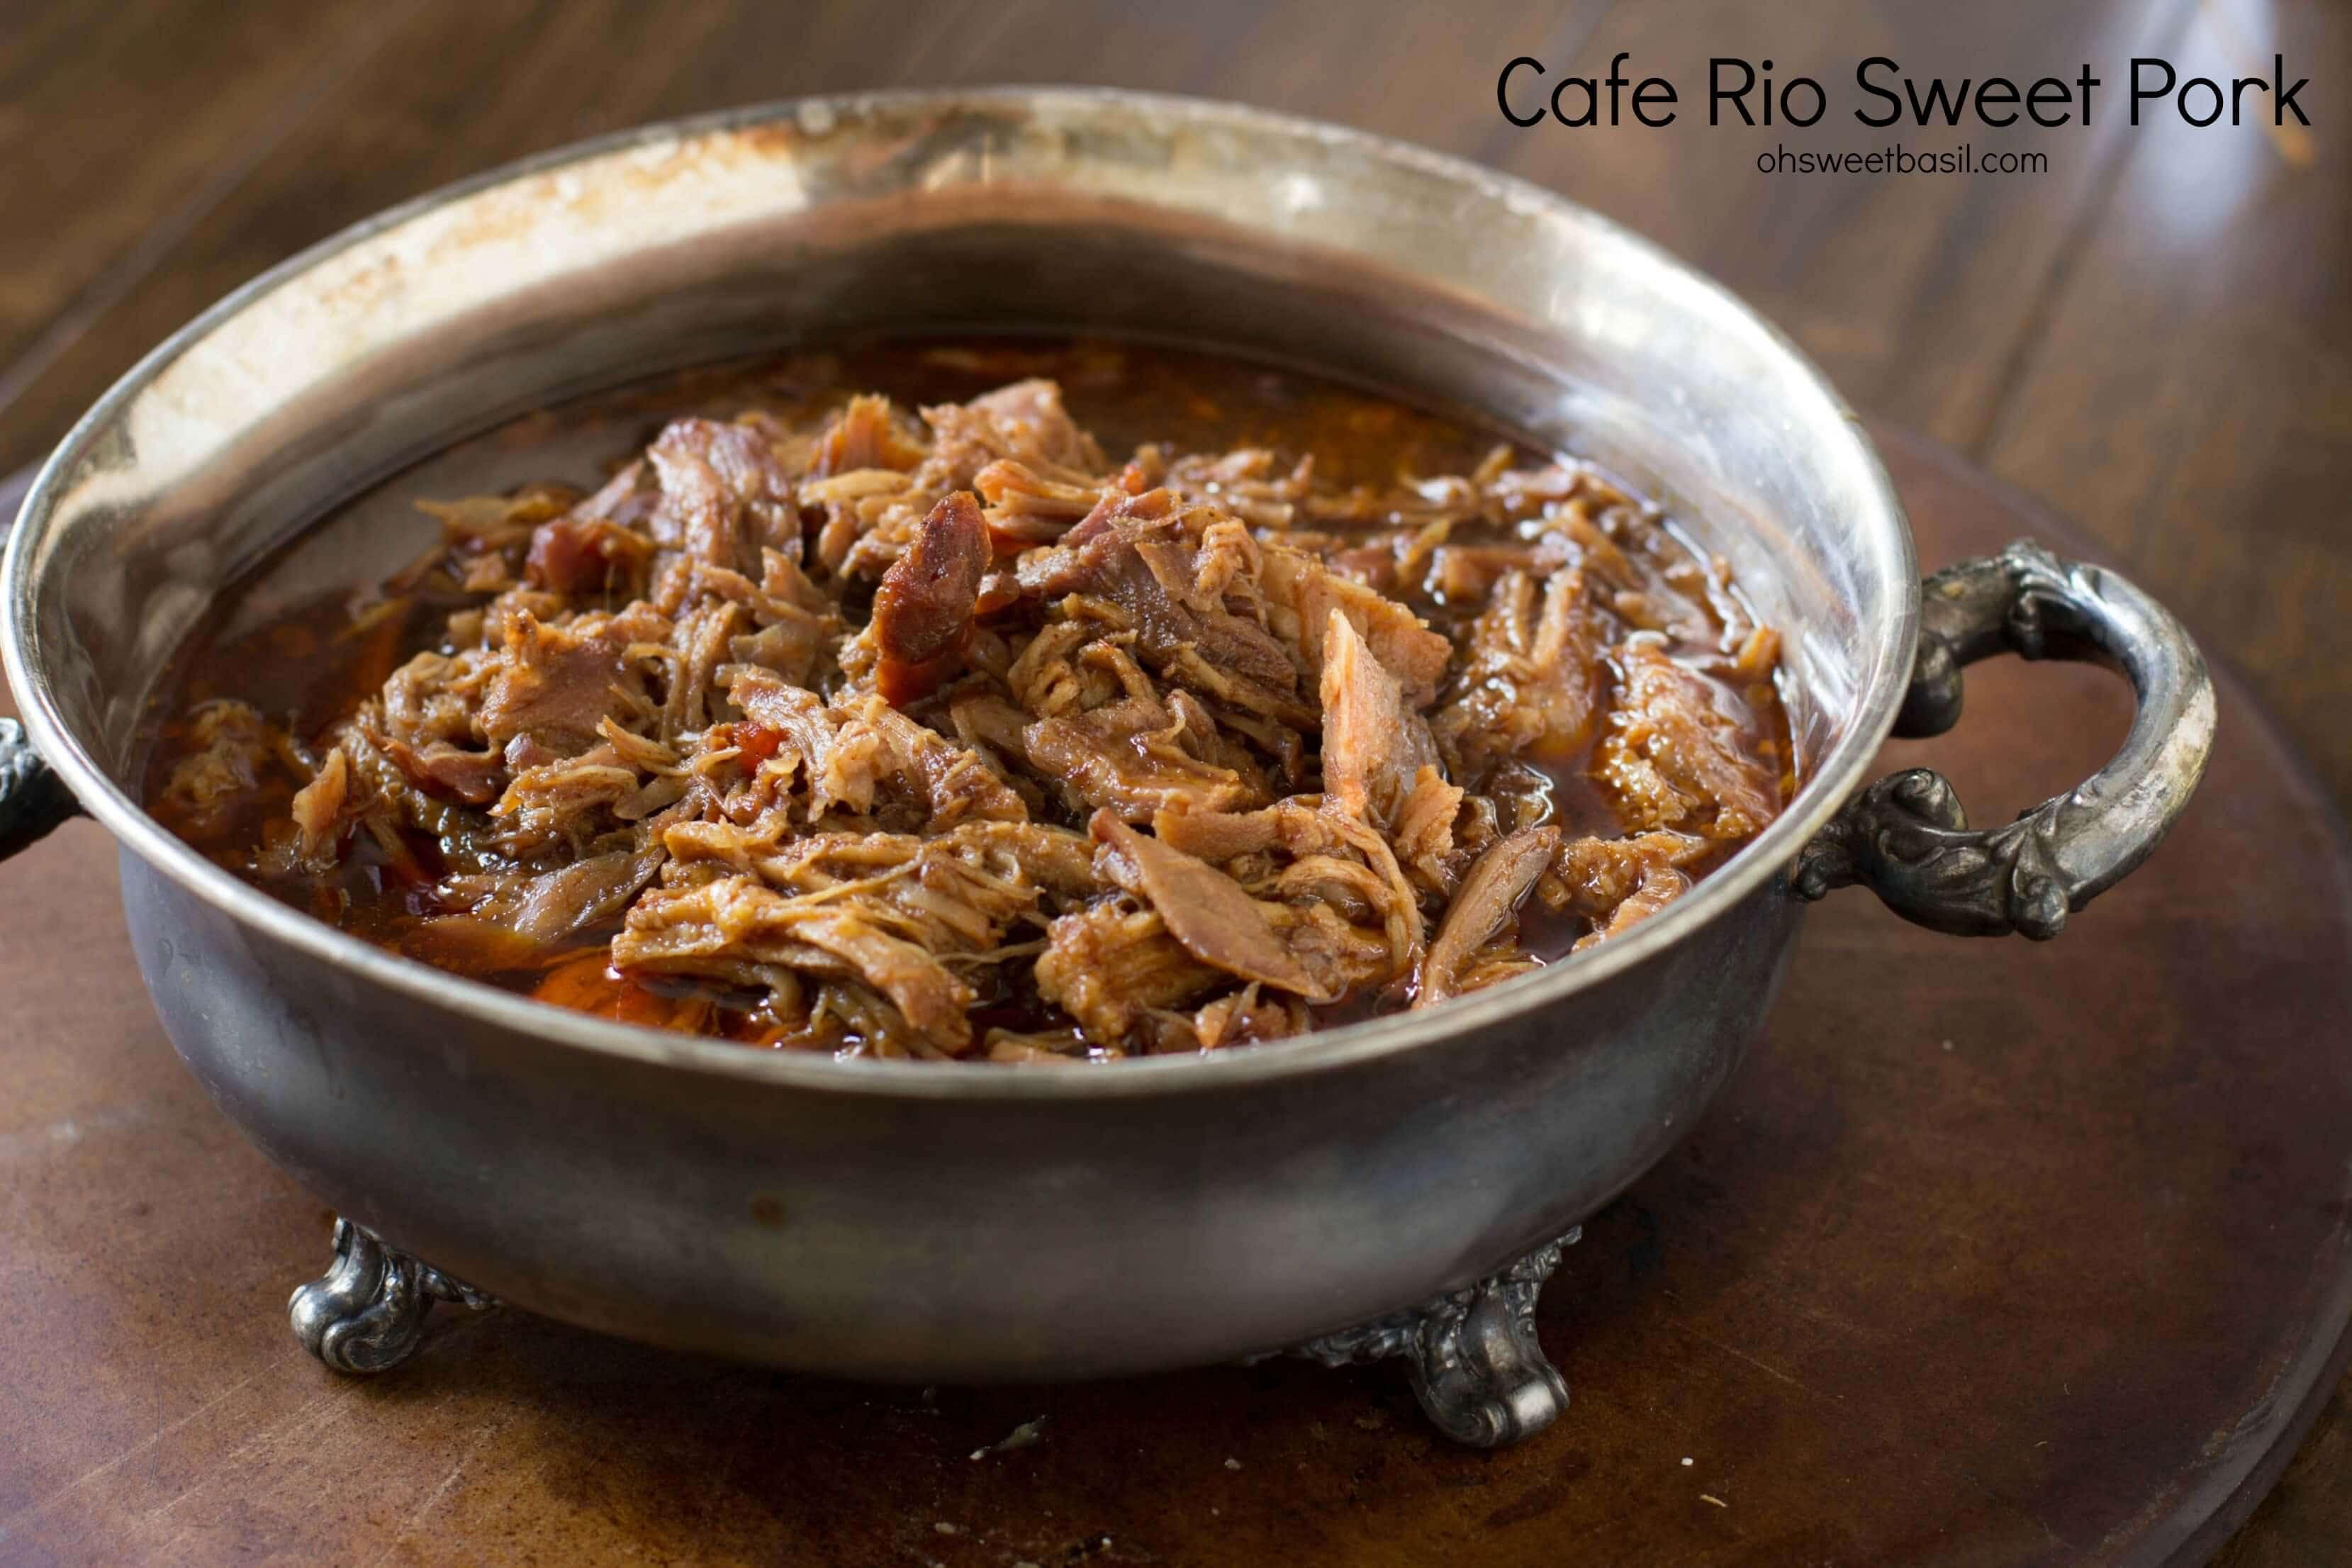 Cafe rio pork recipe without coke